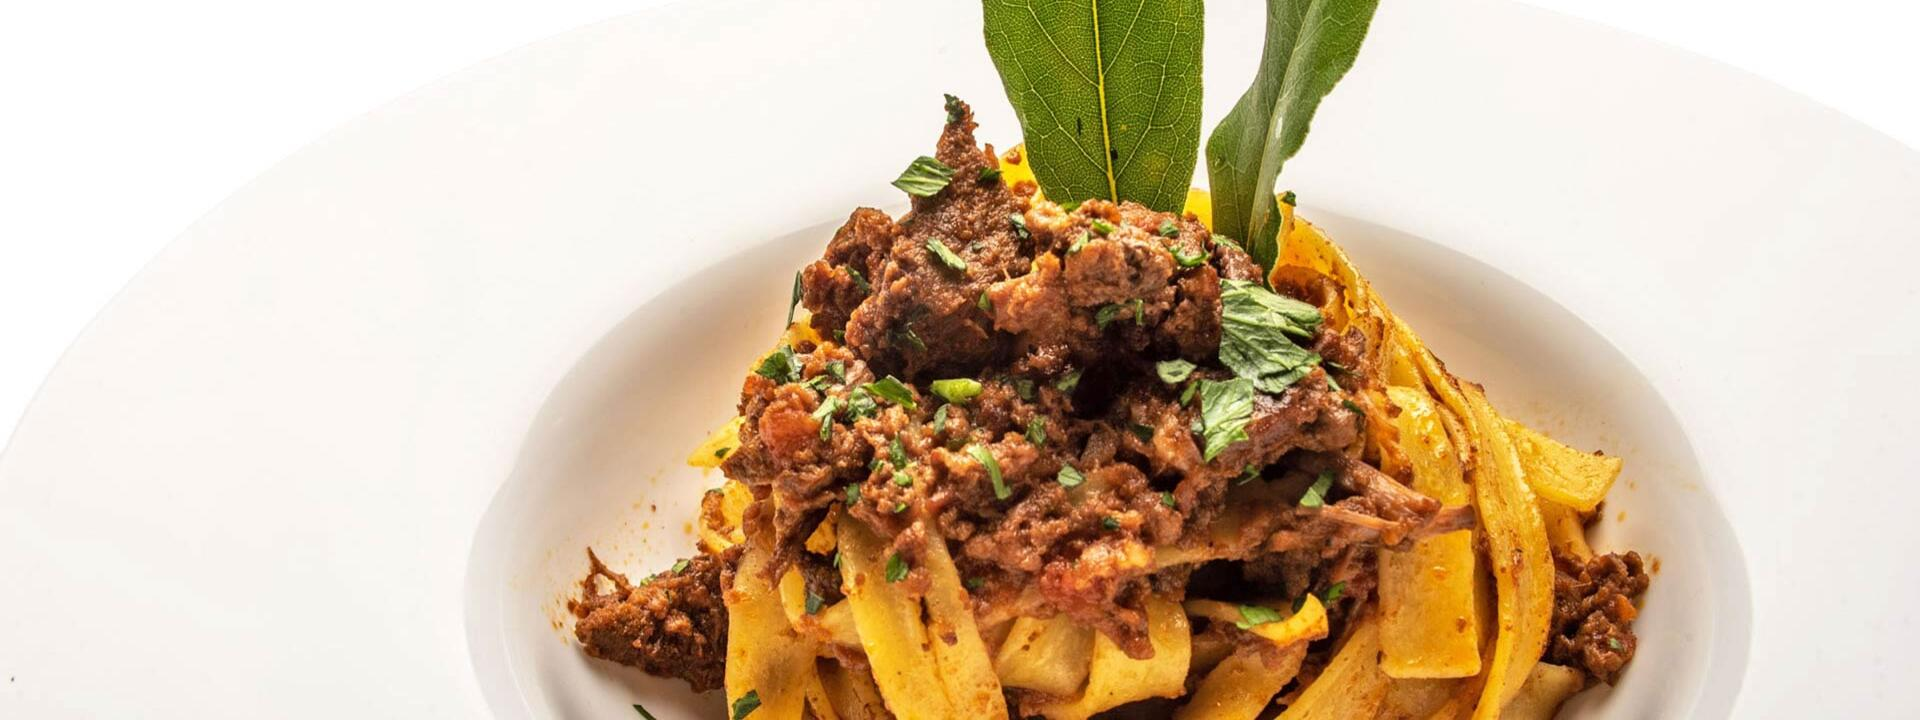 fortunaresort de restaurant-chianciano-terme 012